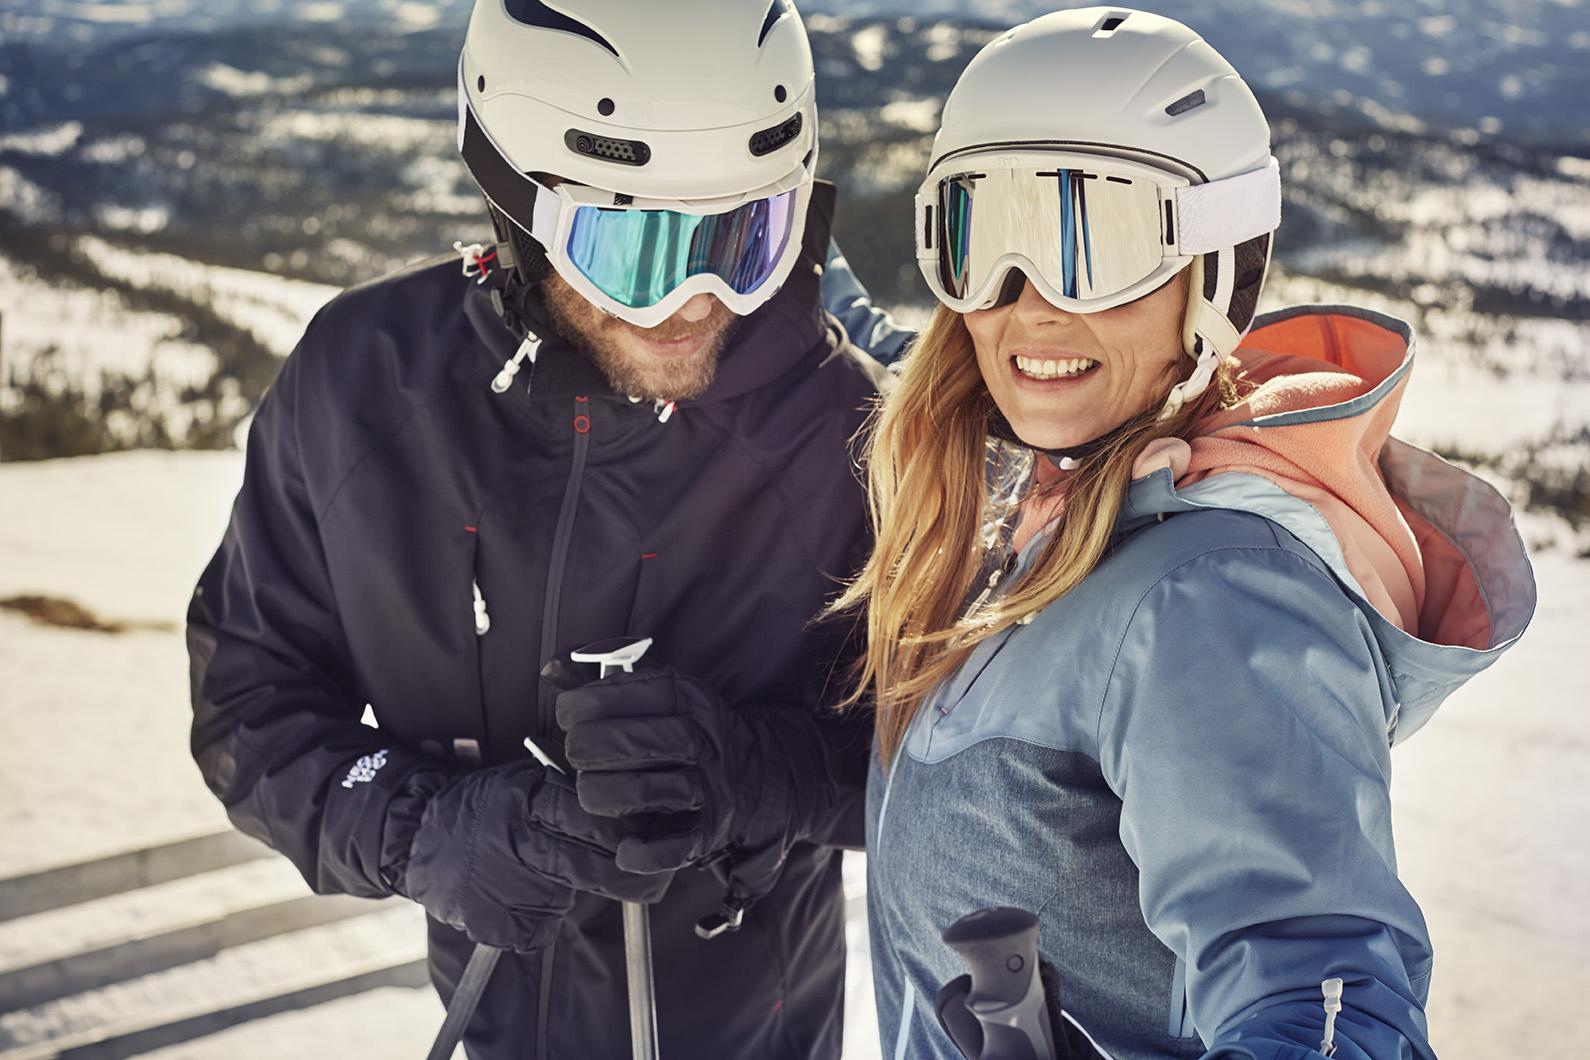 Ski Alpine Lifestyle Campaign shot in Norway for Neomondo/XXL